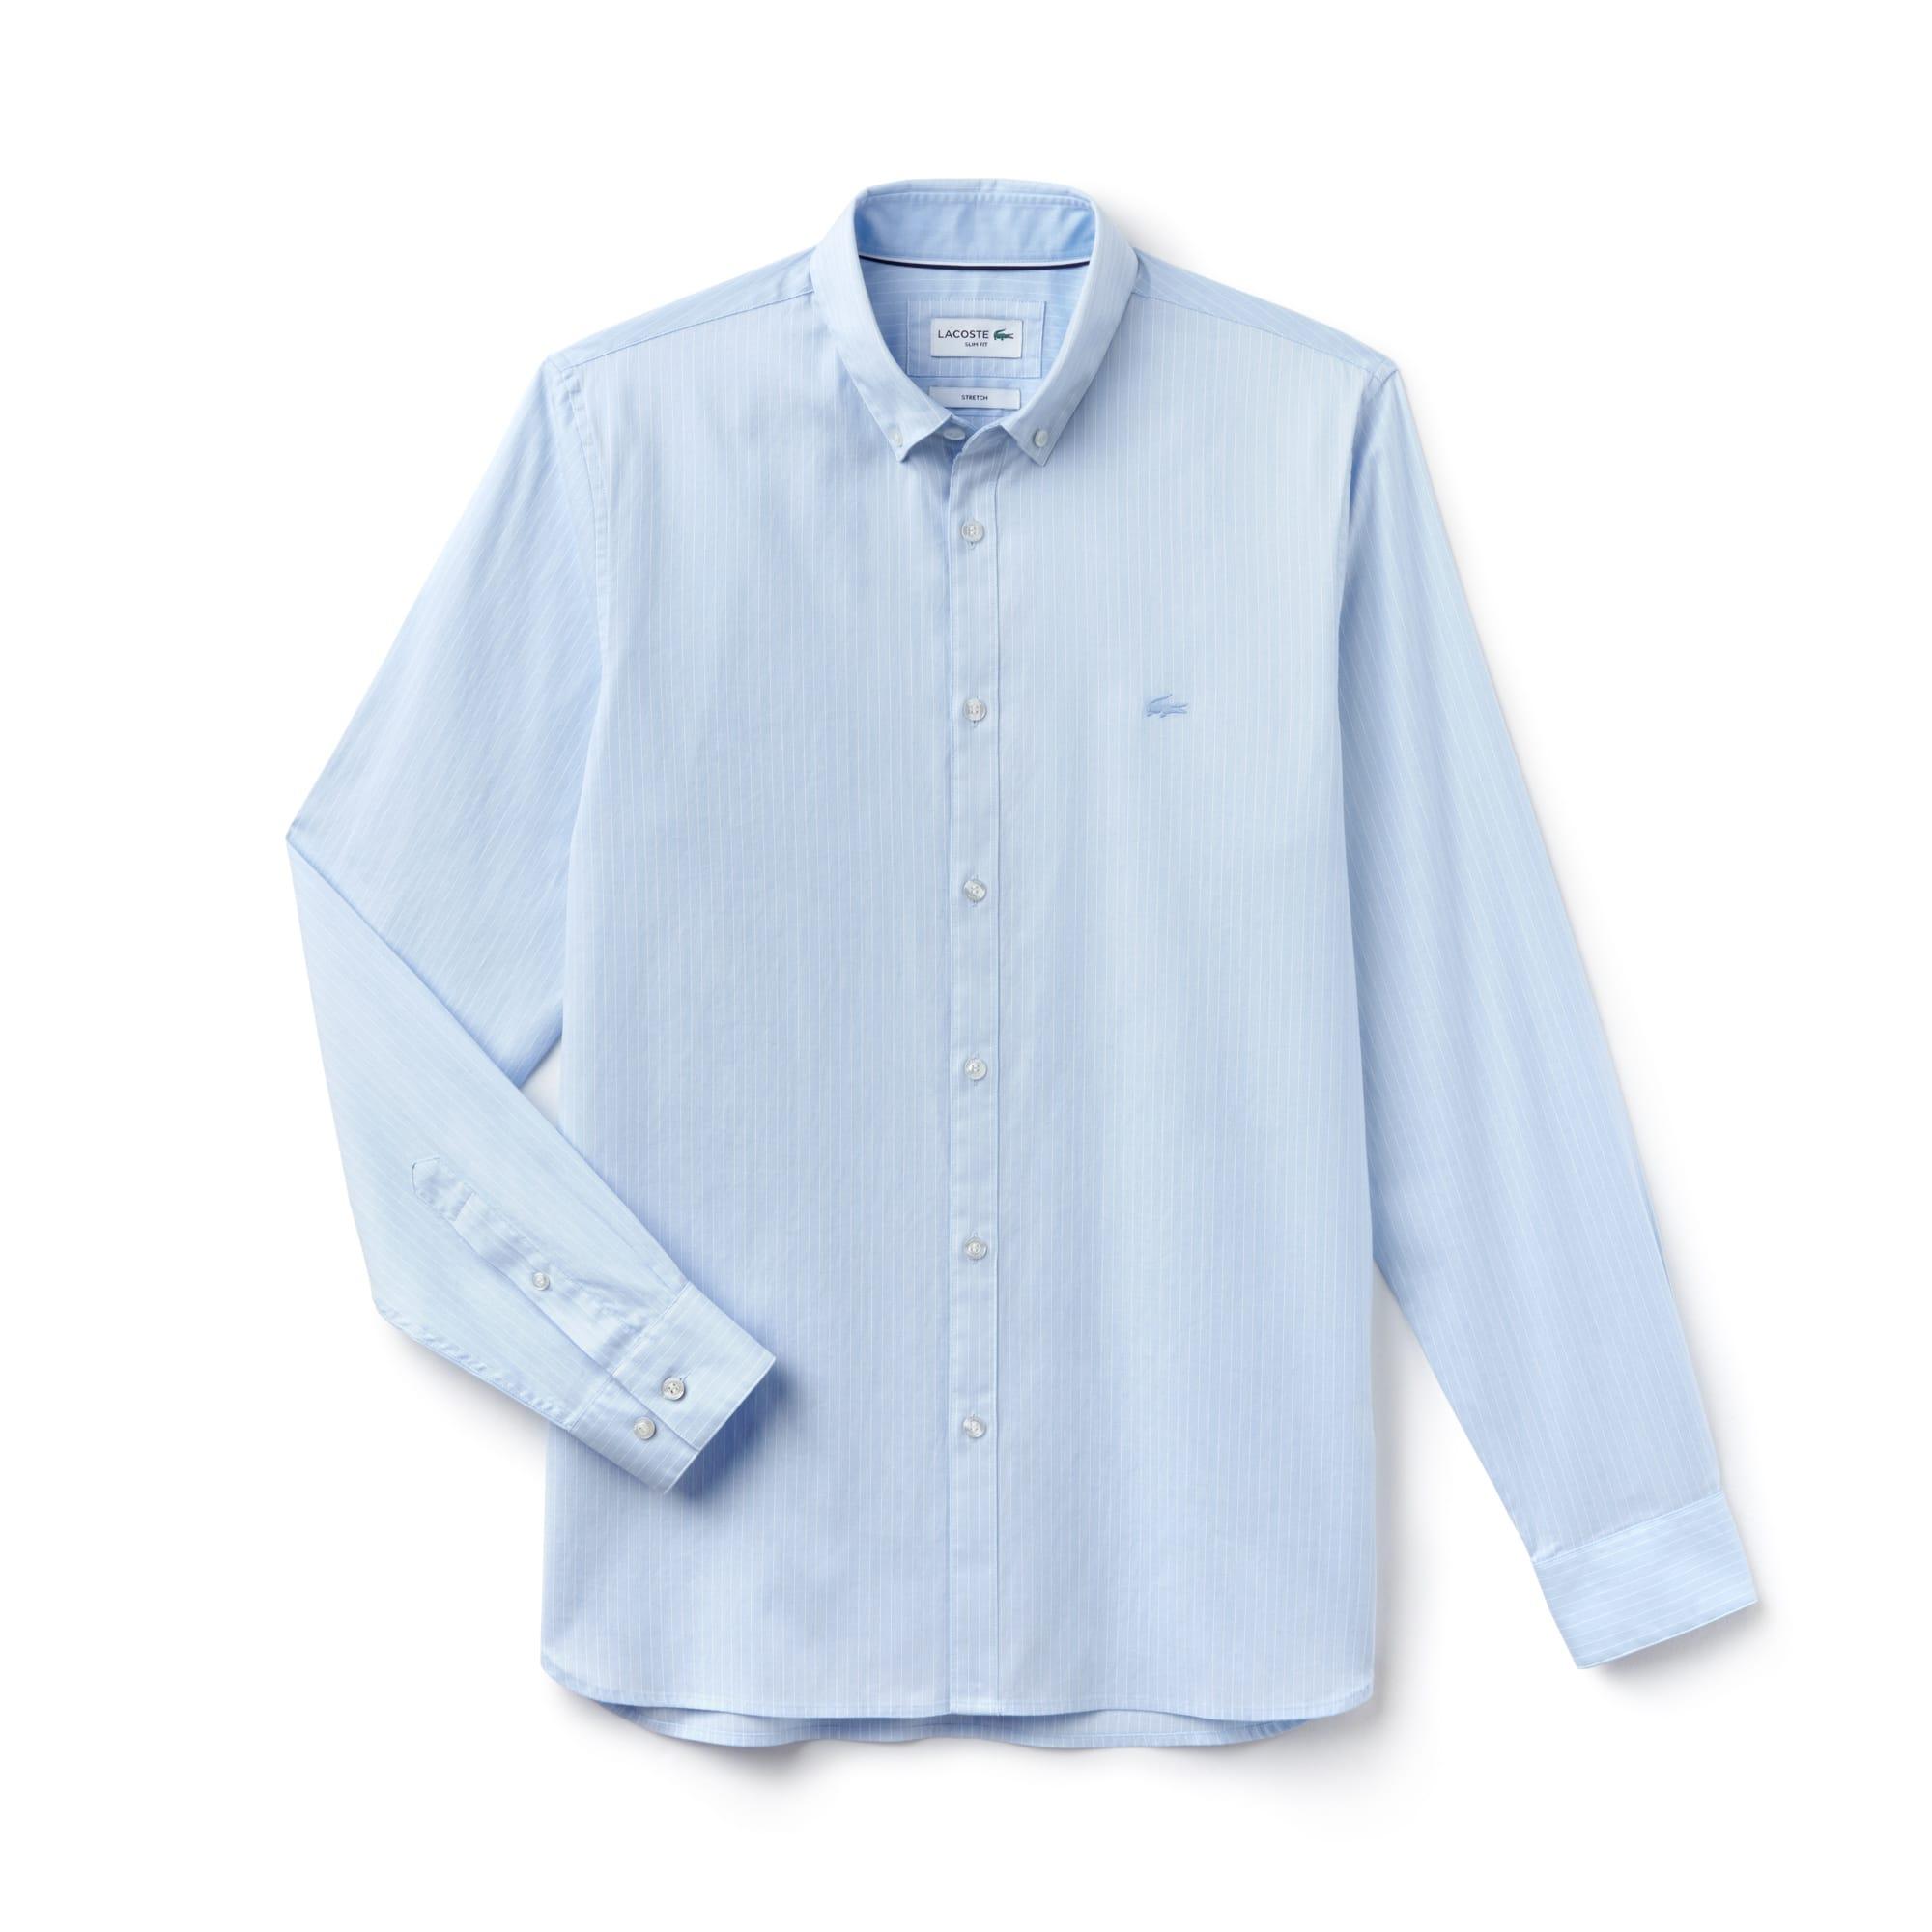 Camicia slim fit in cotone pinpoint stretch a righe